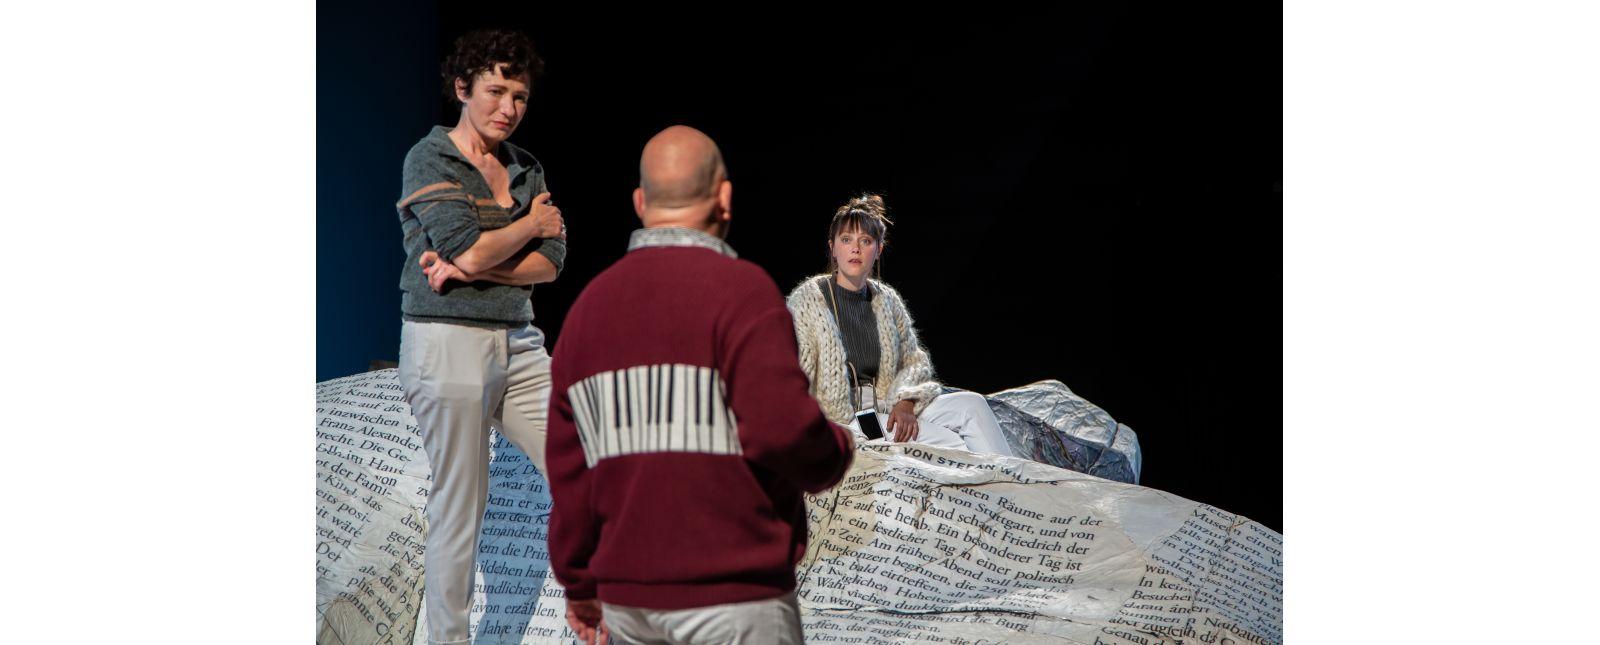 NUR DAS BESTE // Elisabeth Kopp / Holger Kunkel / Iris Becher // 2020 // Laura Nickel